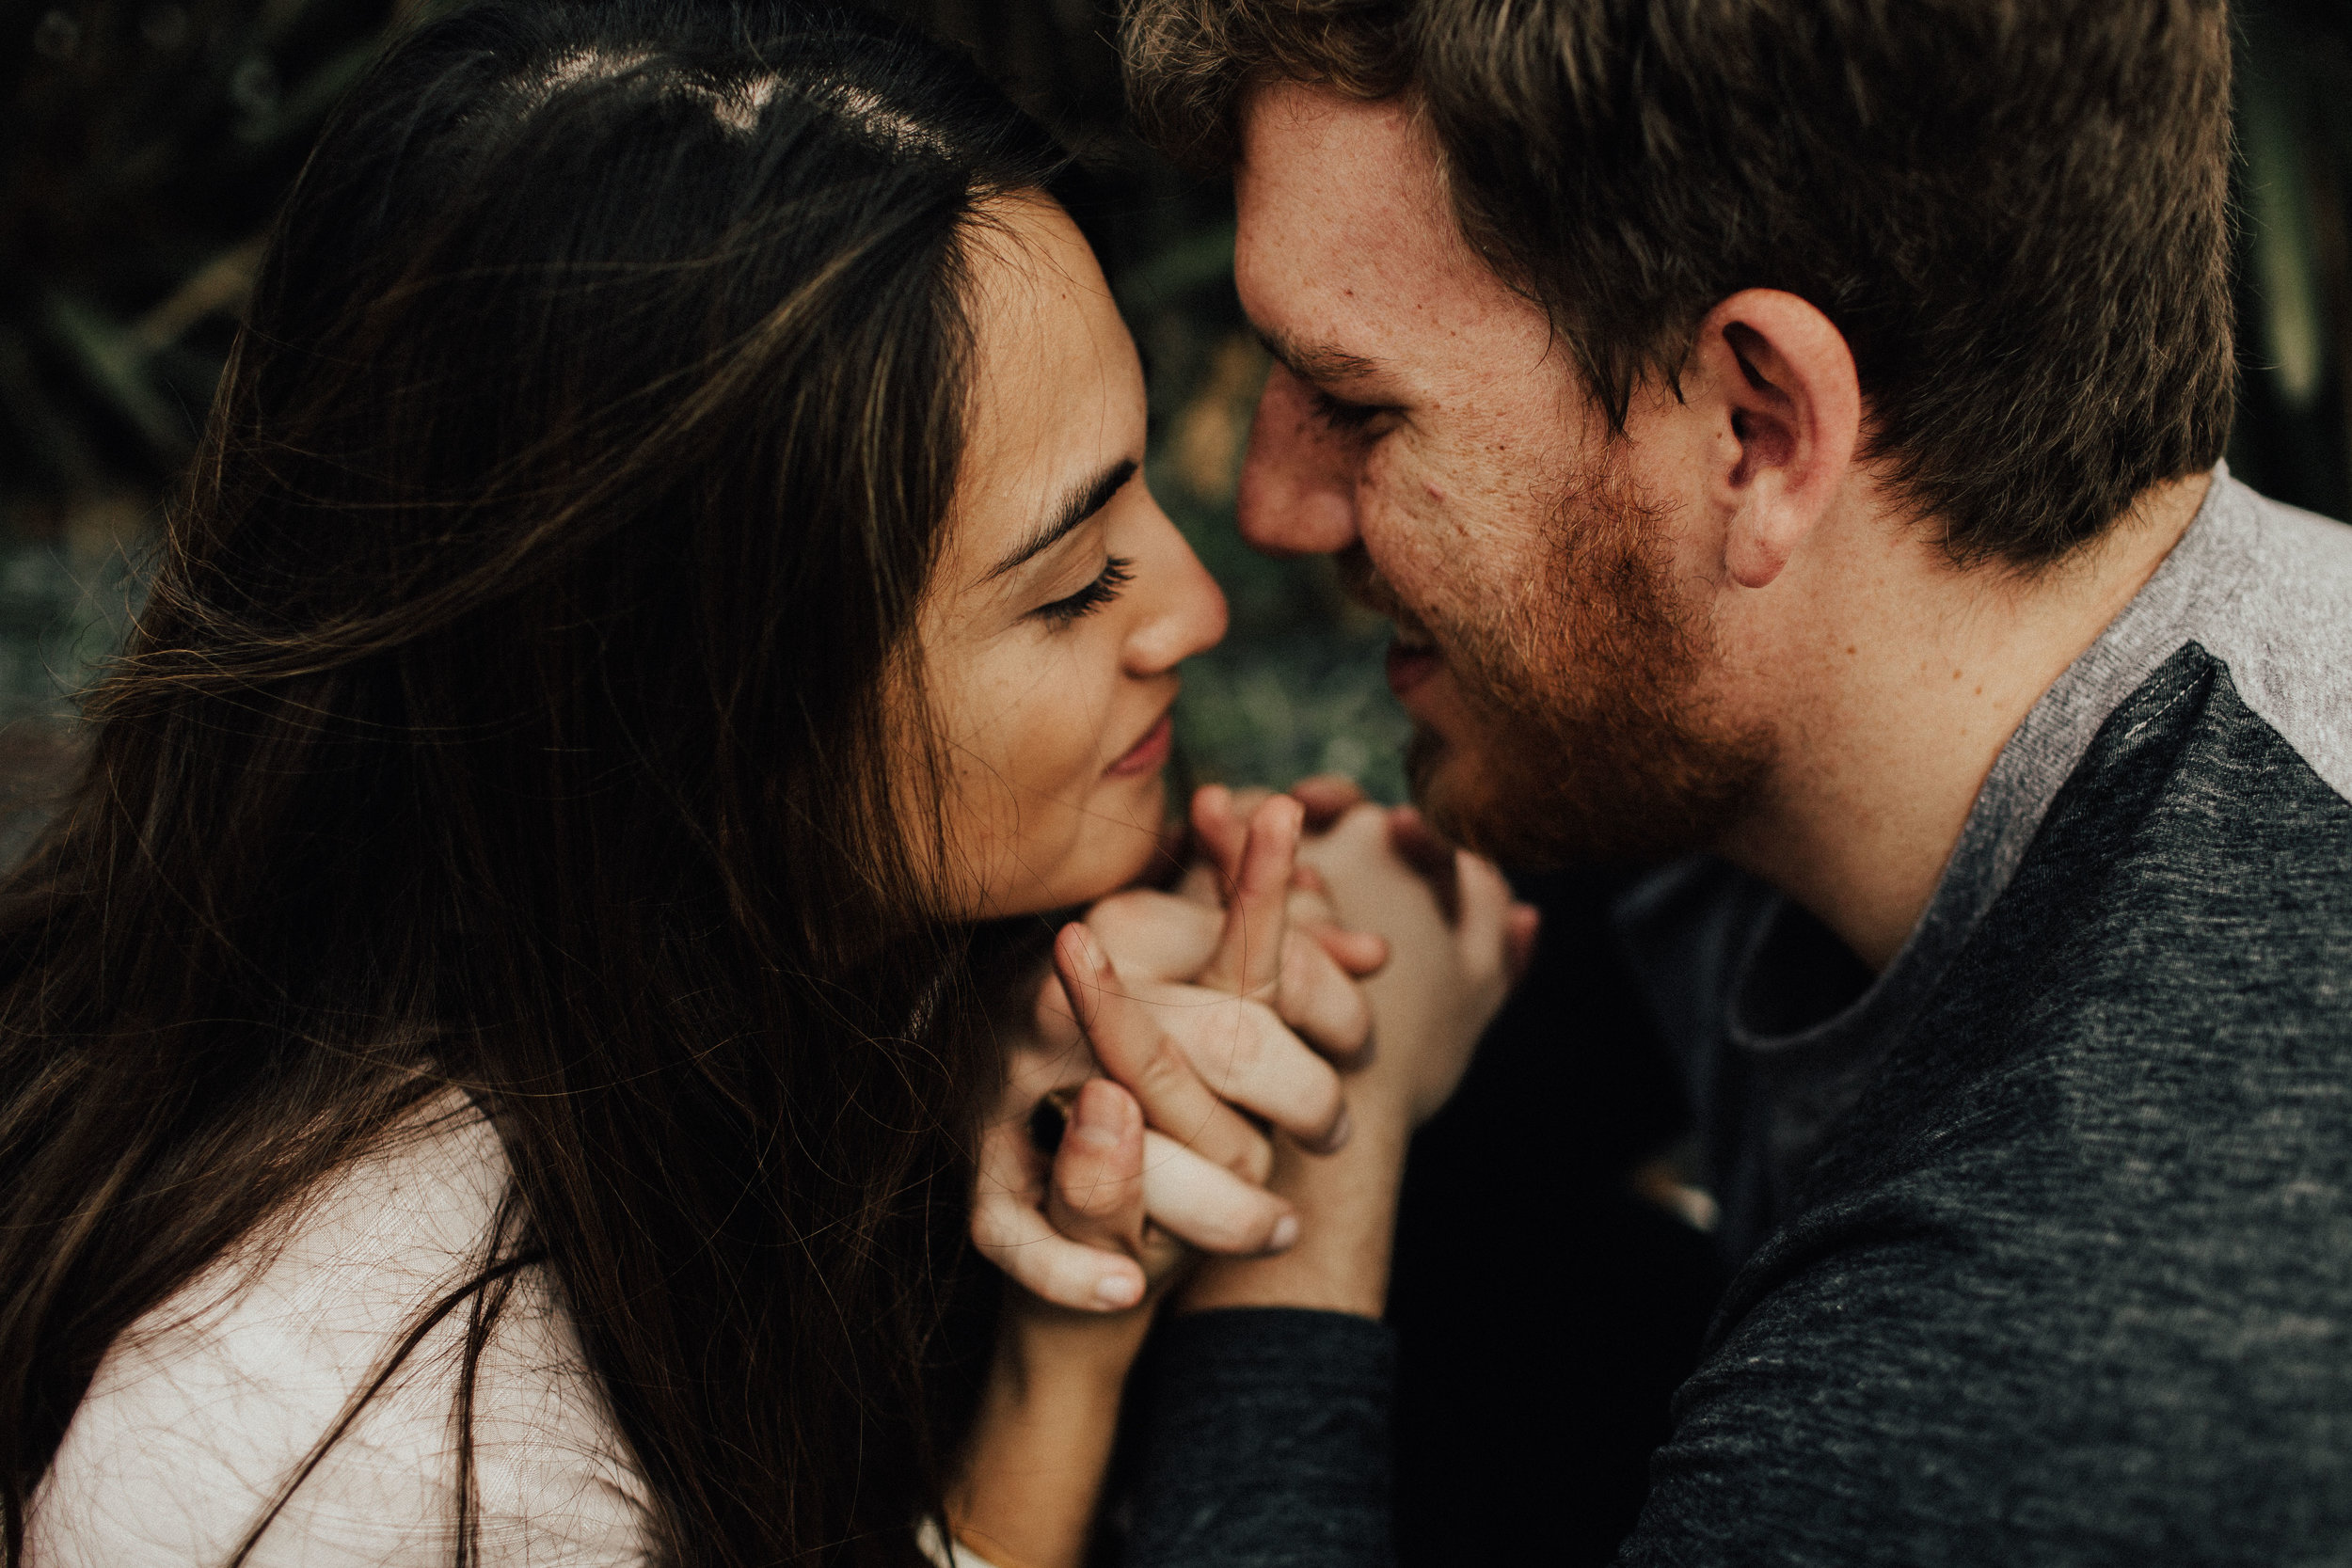 bianca-troy-east-austin-couple-photographer-14